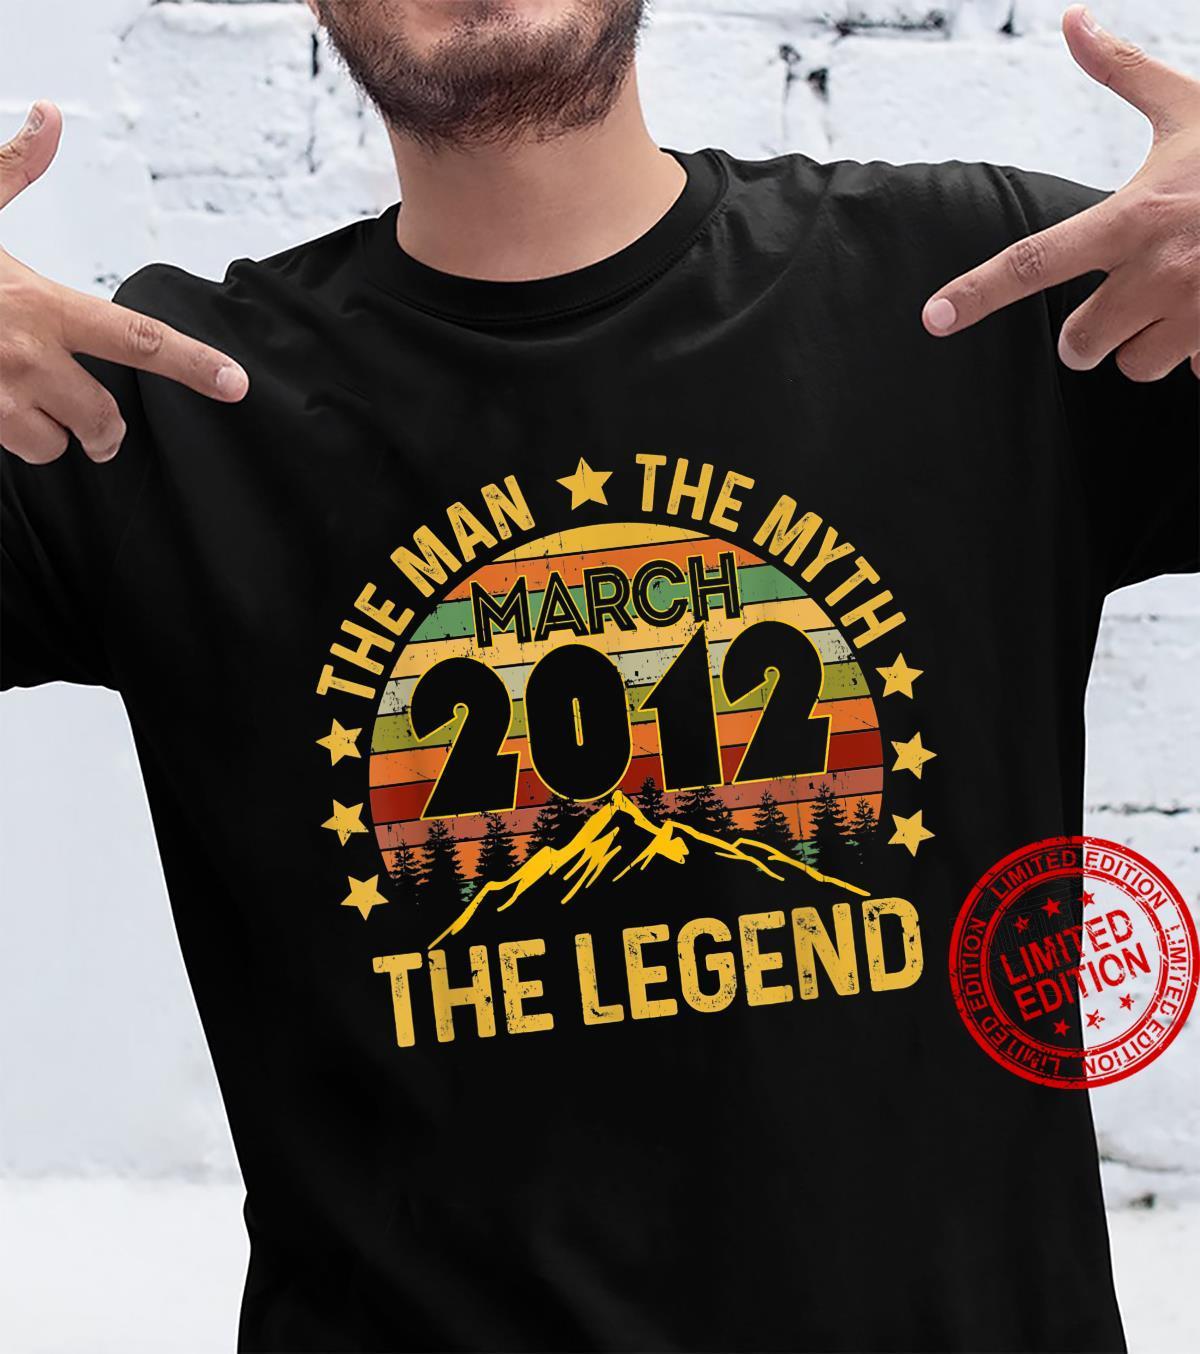 9 Years Old Birthday Shirt The Man Myth Legend March 2012 Shirt